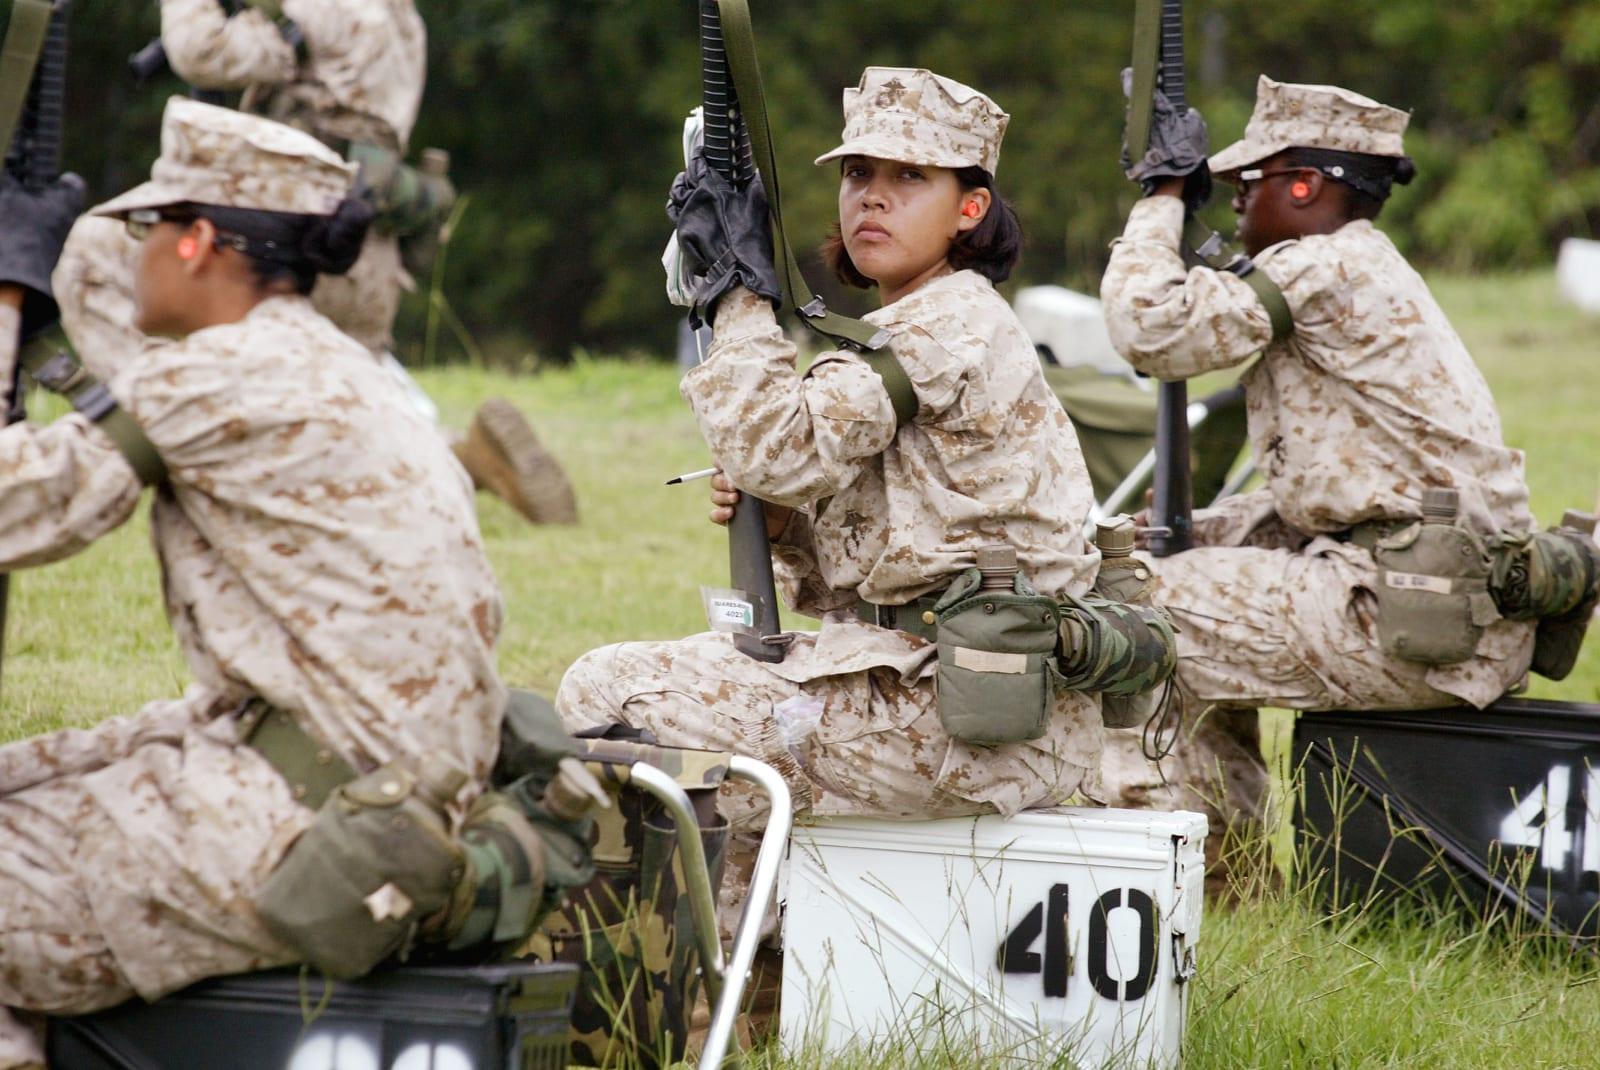 Nude topless female soldiers defi boyfriend